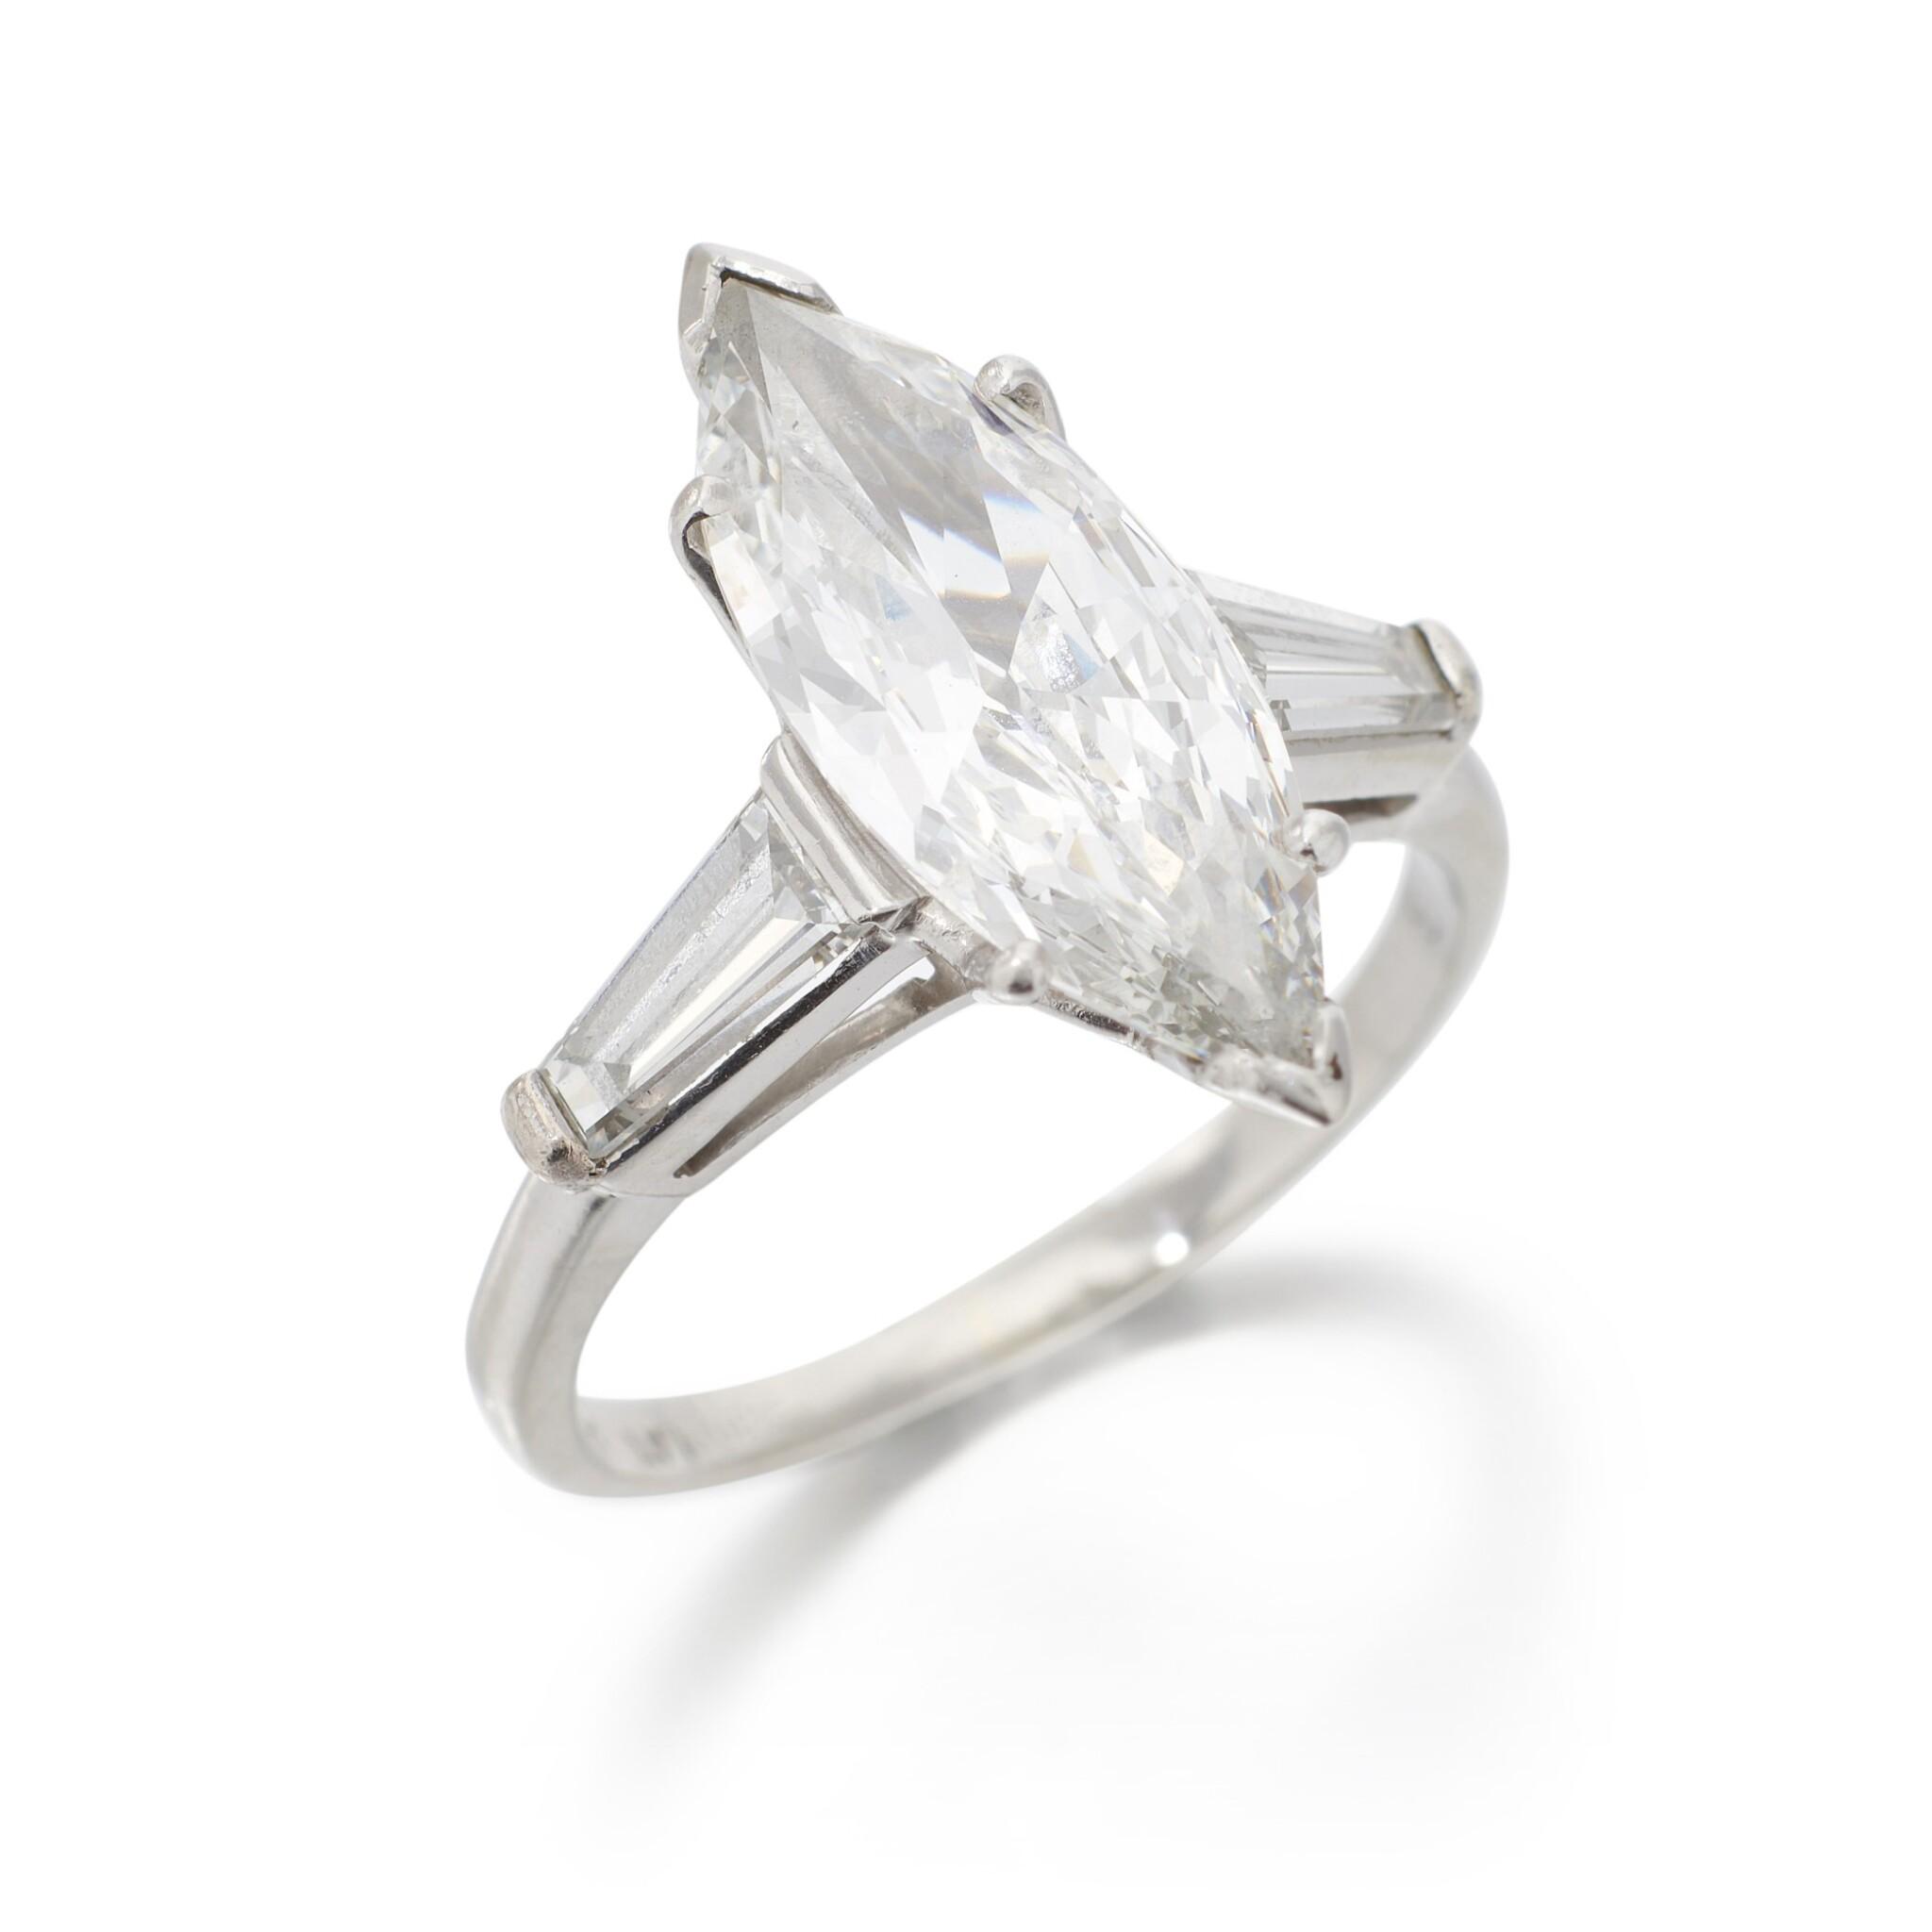 DIAMOND RING   (ANELLO IN DIAMANTI)